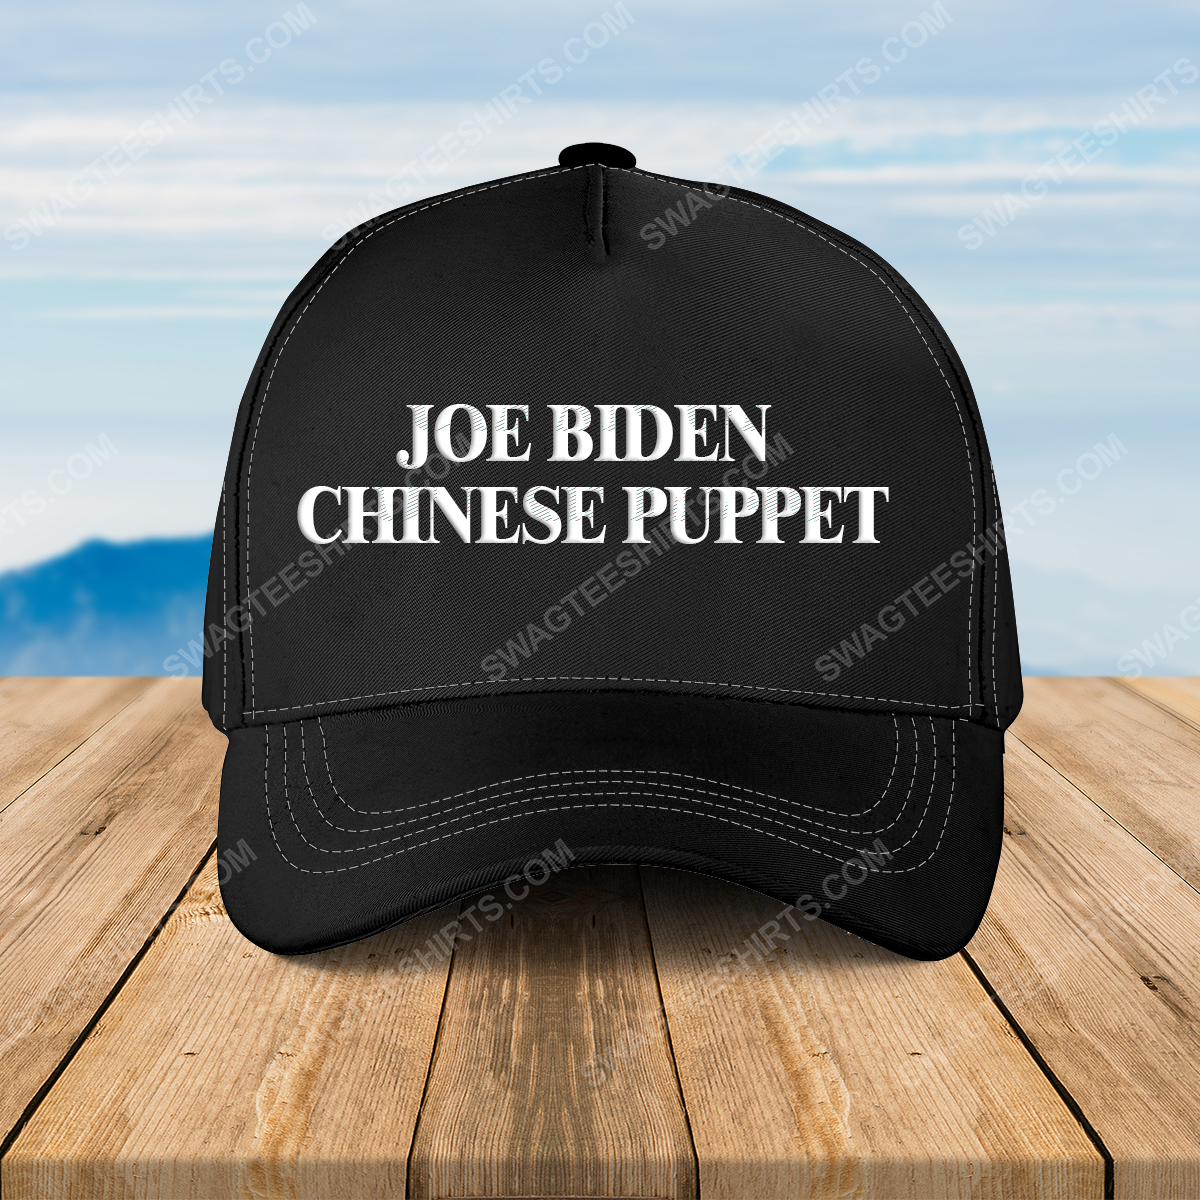 Joe biden chinese puppet full print classic hat 1 - Copy